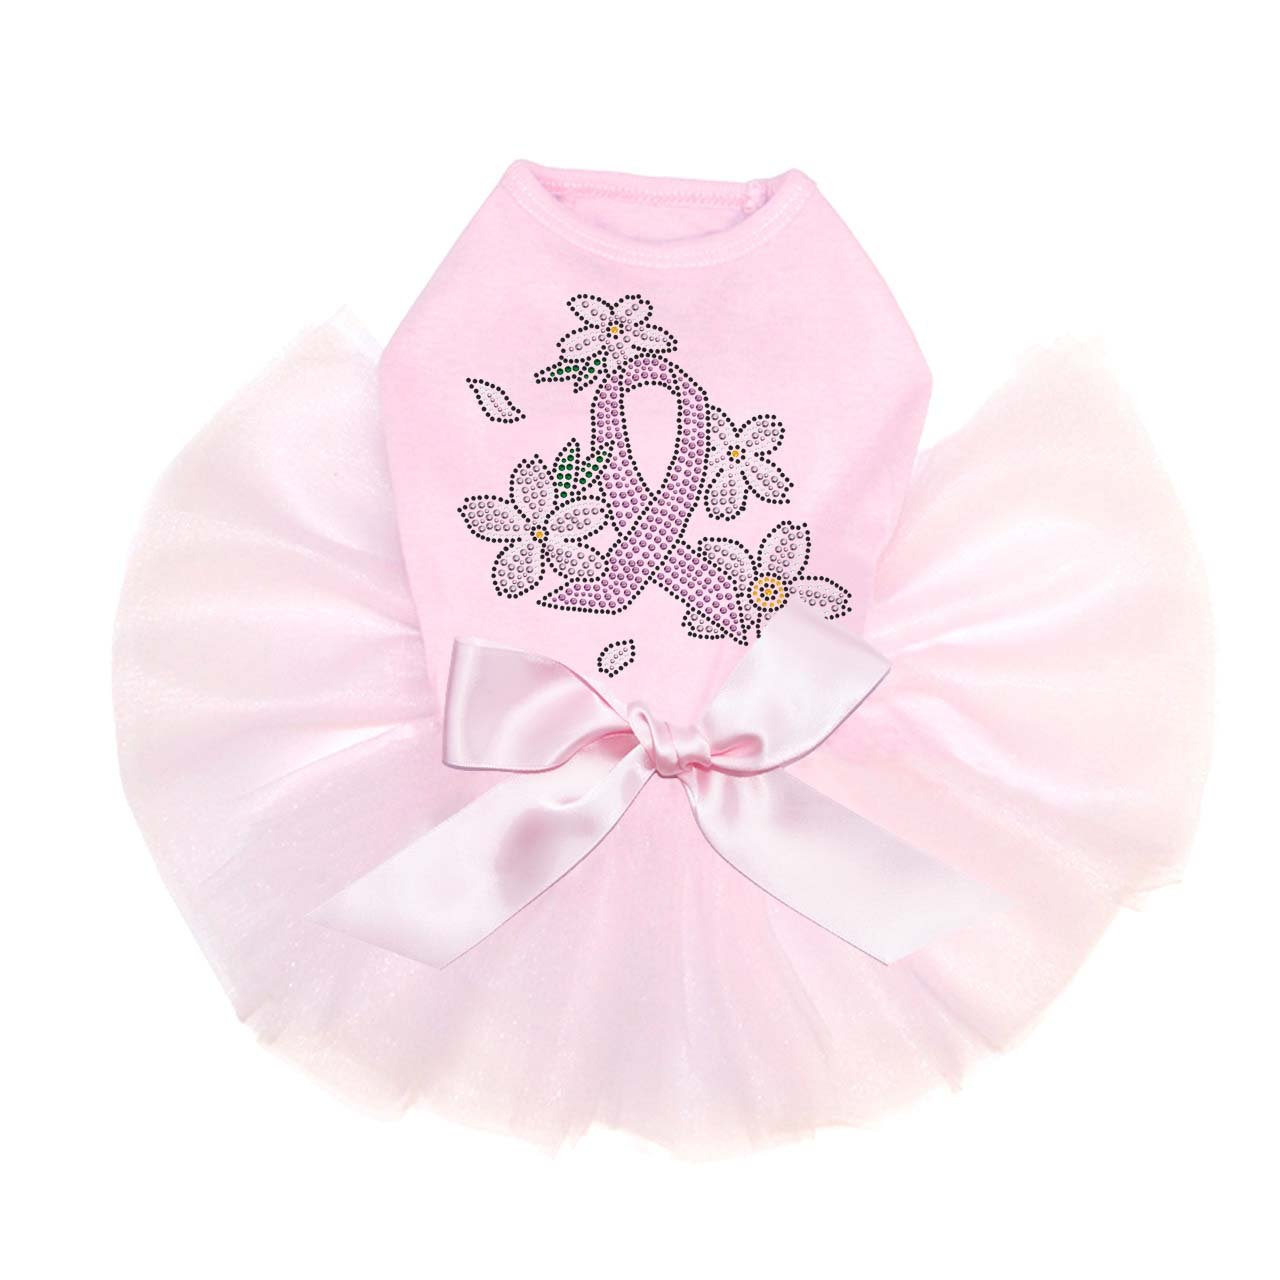 Pink Ribbon with Flowers - Bling Rhinestone Dog Tutu Dress, 3XL Pink